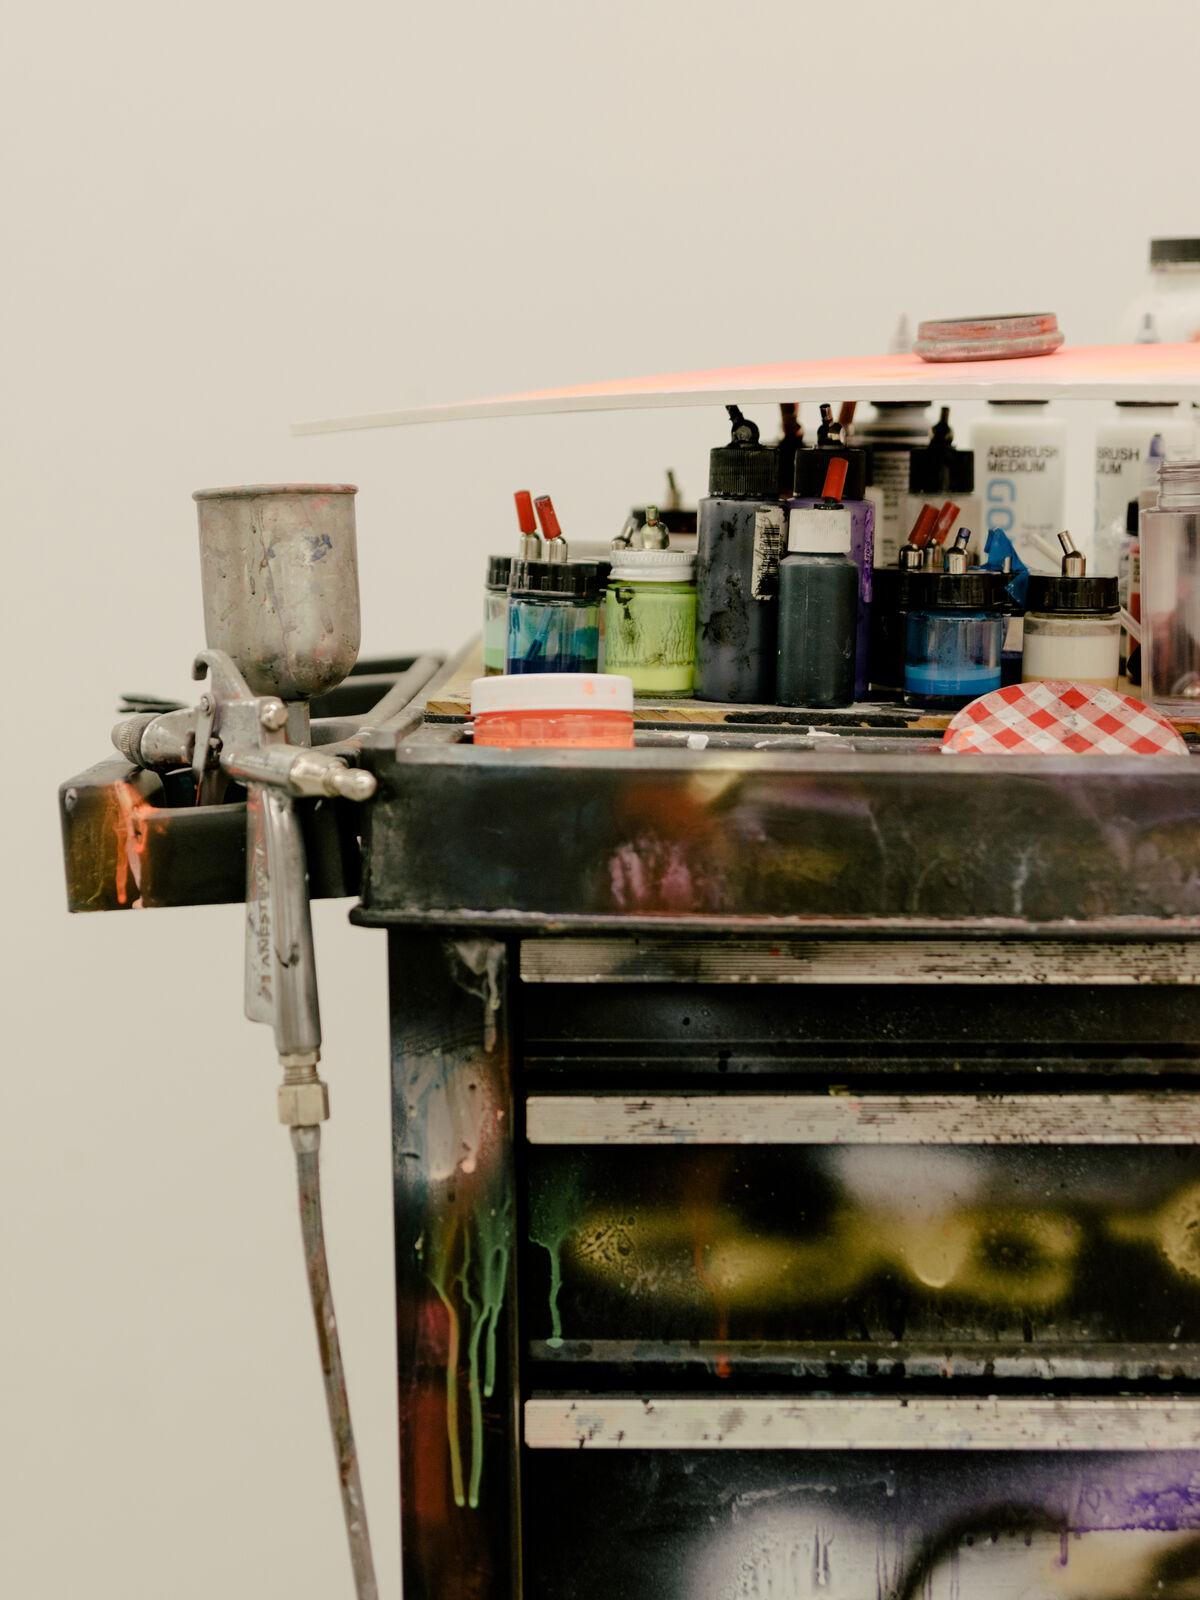 Julie Mehretu Paints to Make Sense of a Violent, Chaotic World - Artsy